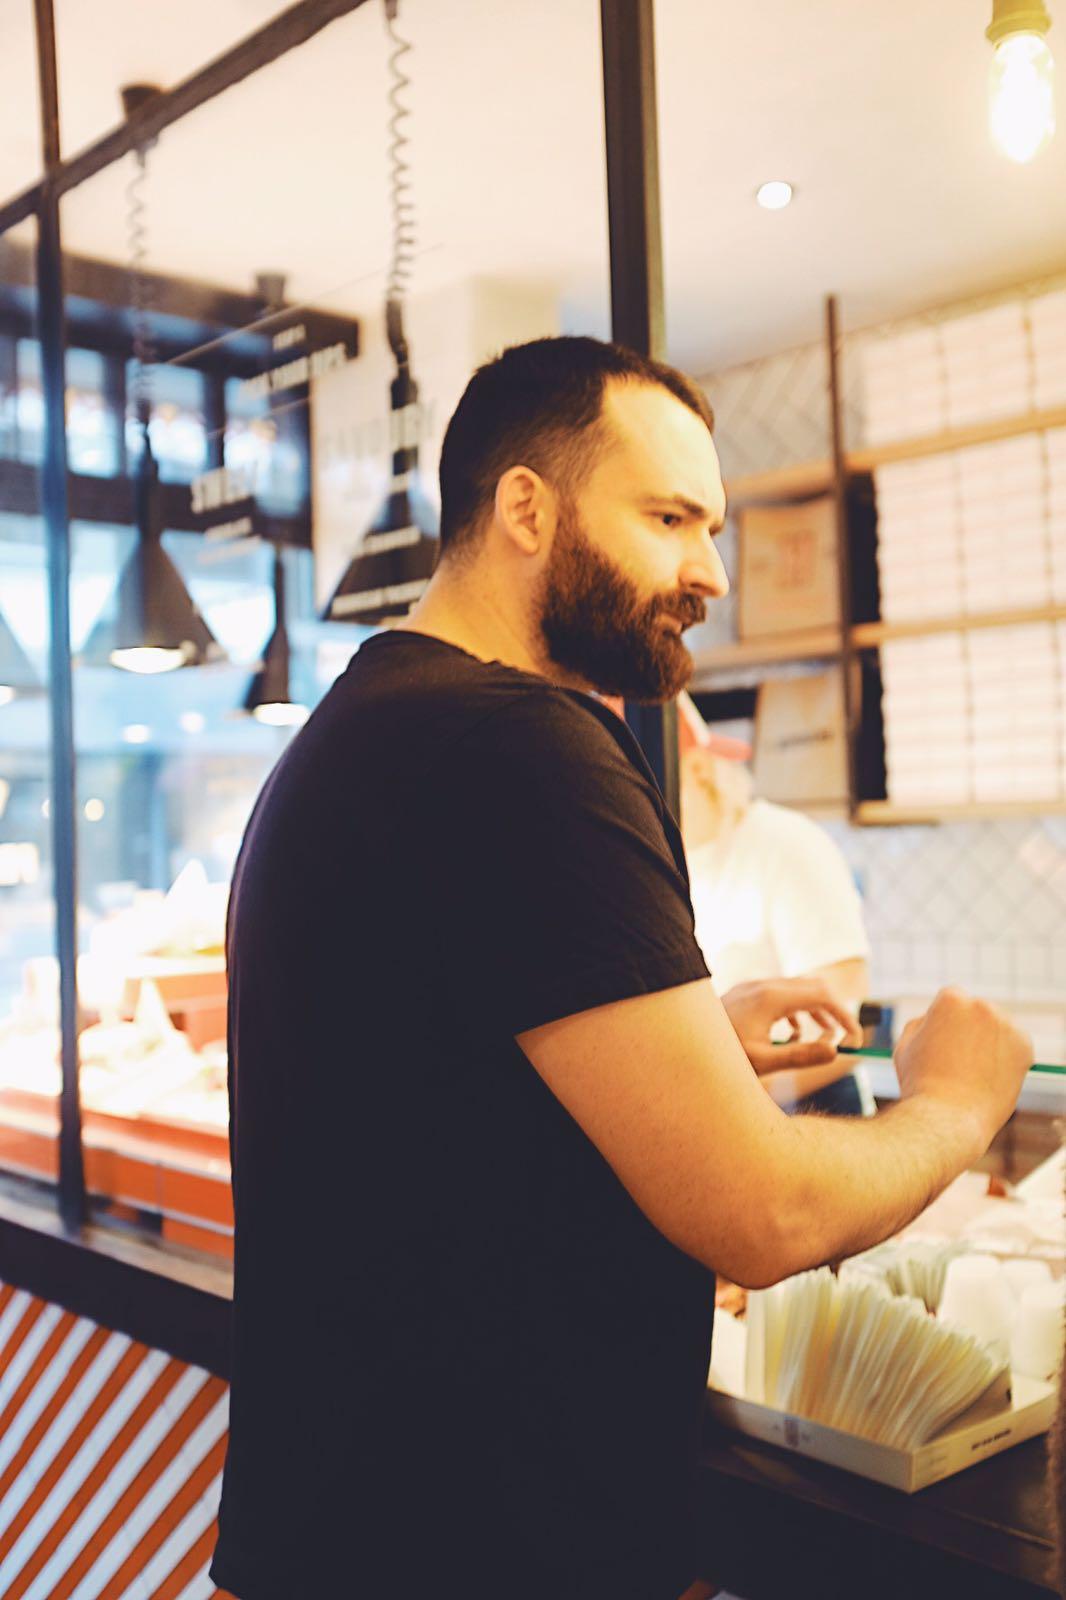 James choosing his Hipchips at their Soho restaurant